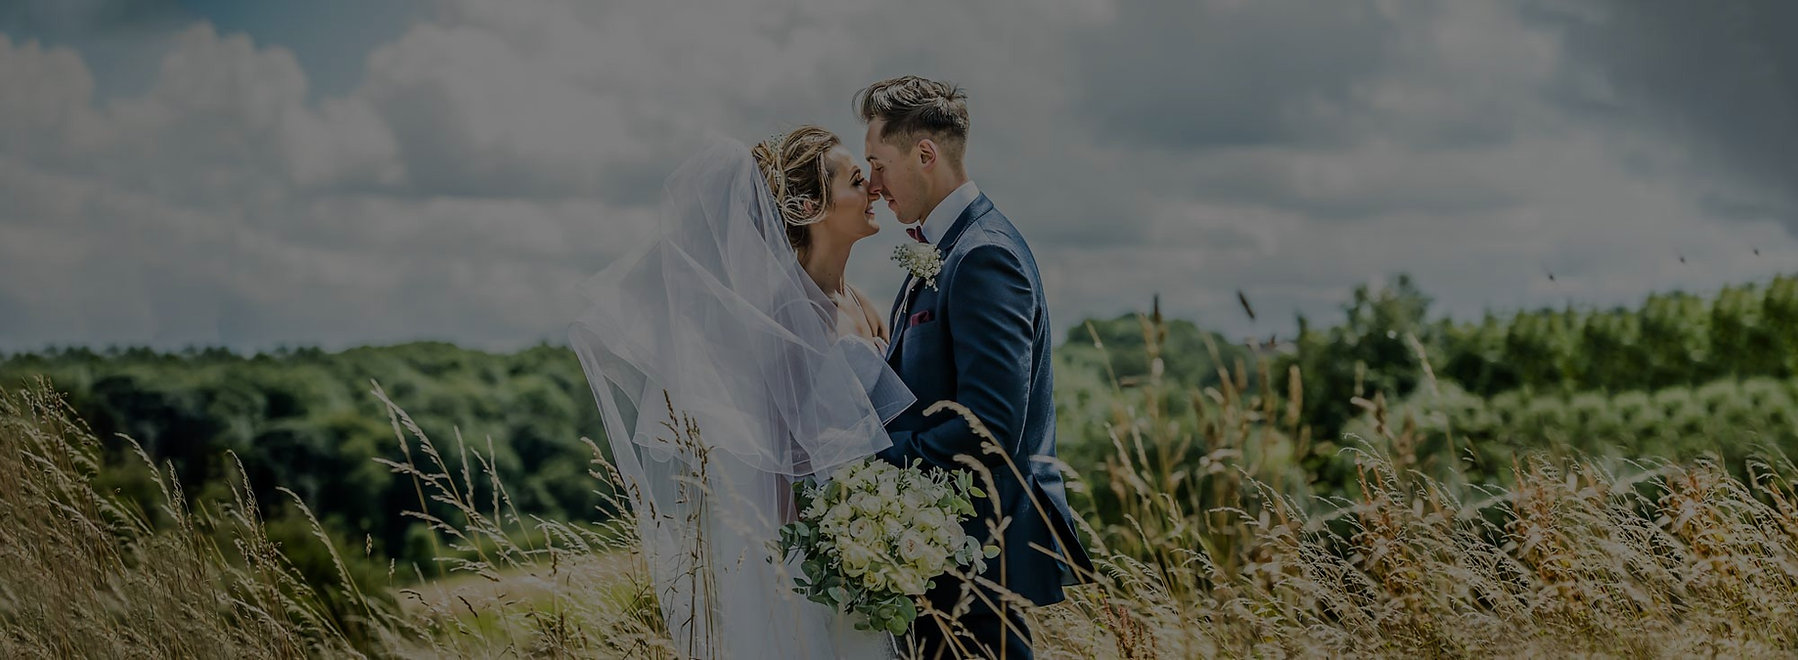 Wedding-Photographer-Wakeifield-crop_edi